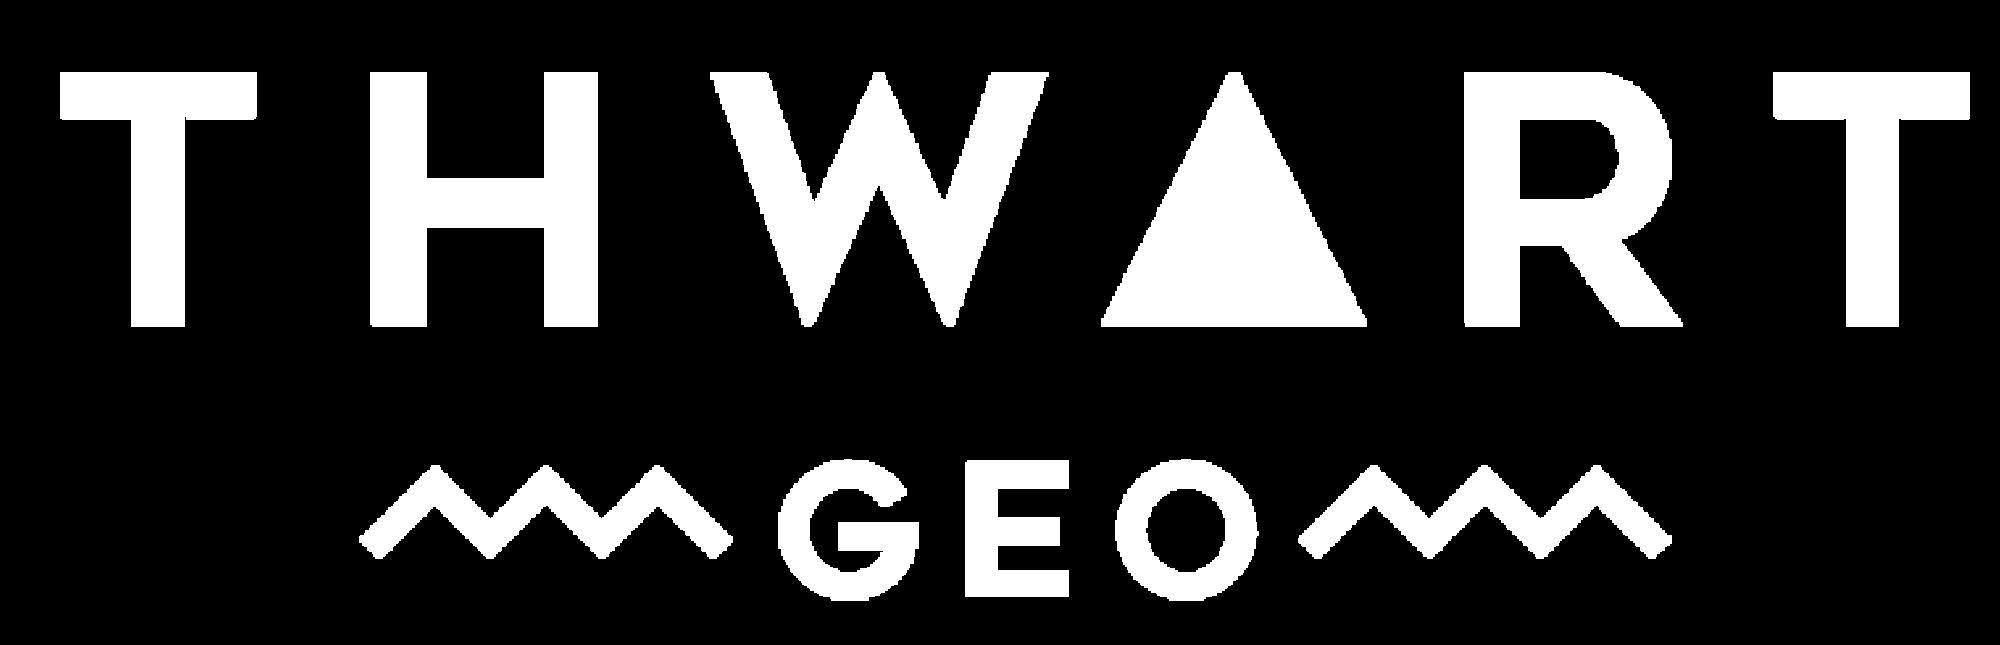 THWART GEO